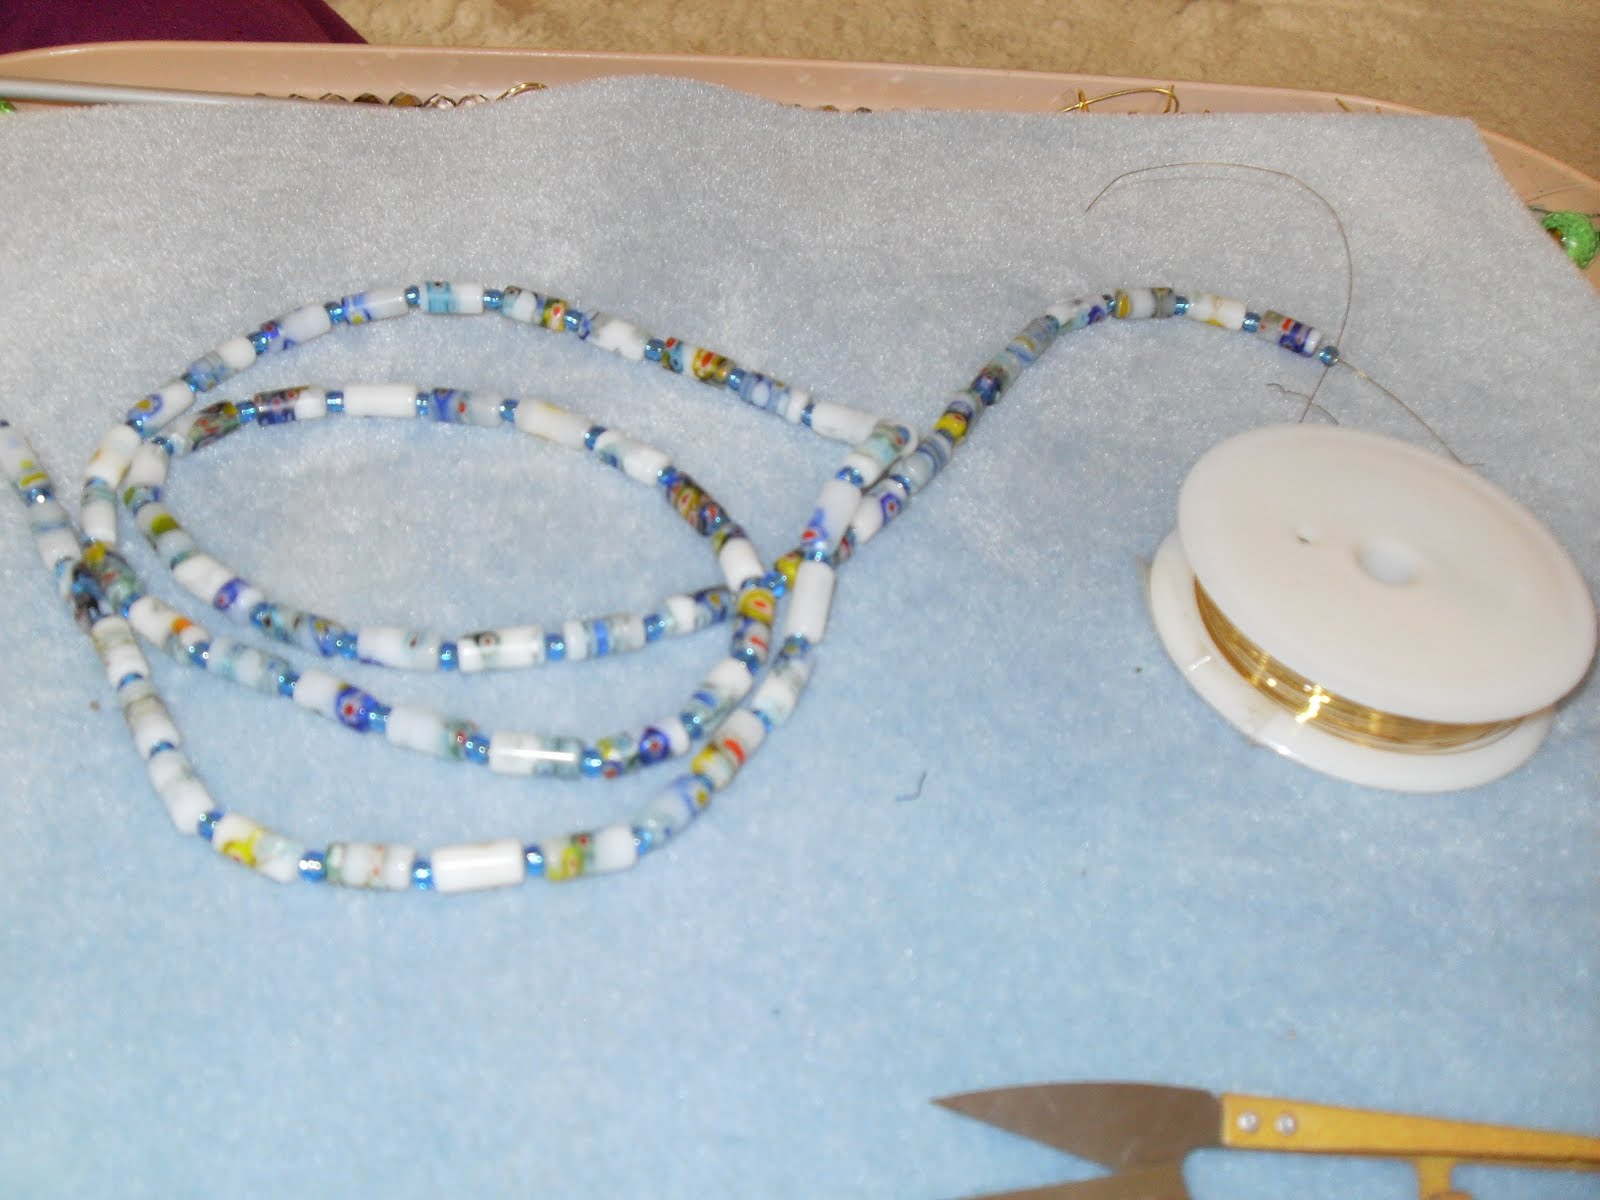 Crafty Carols Crafty Adventures: knitting wire necklace